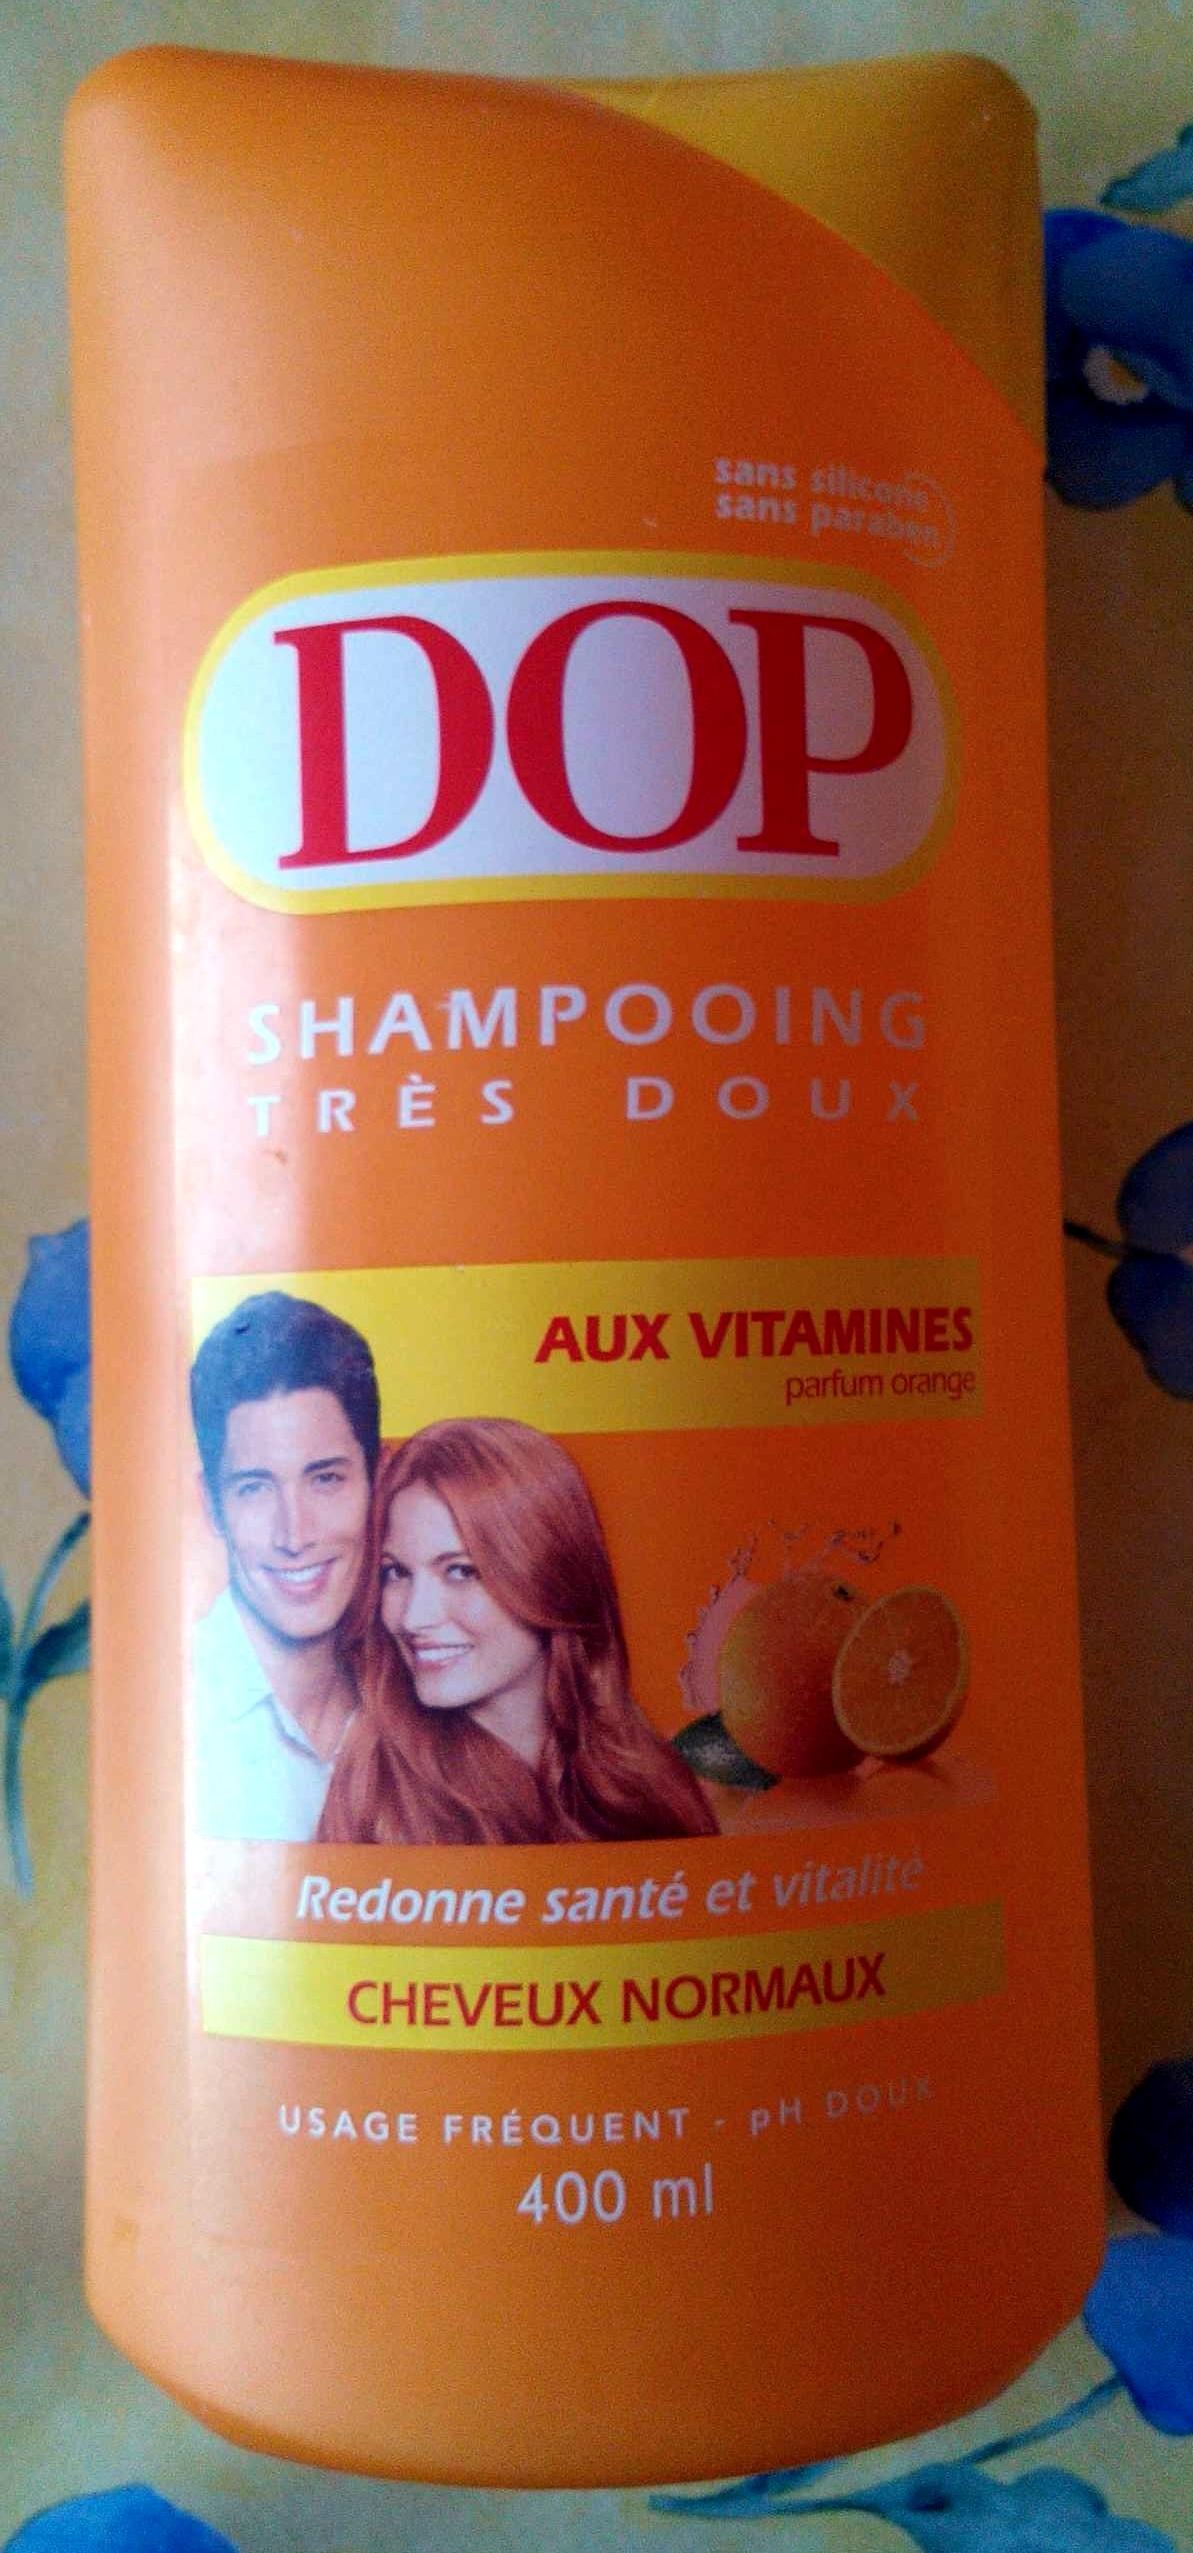 Shampooing très doux aux vitamines - Product - fr